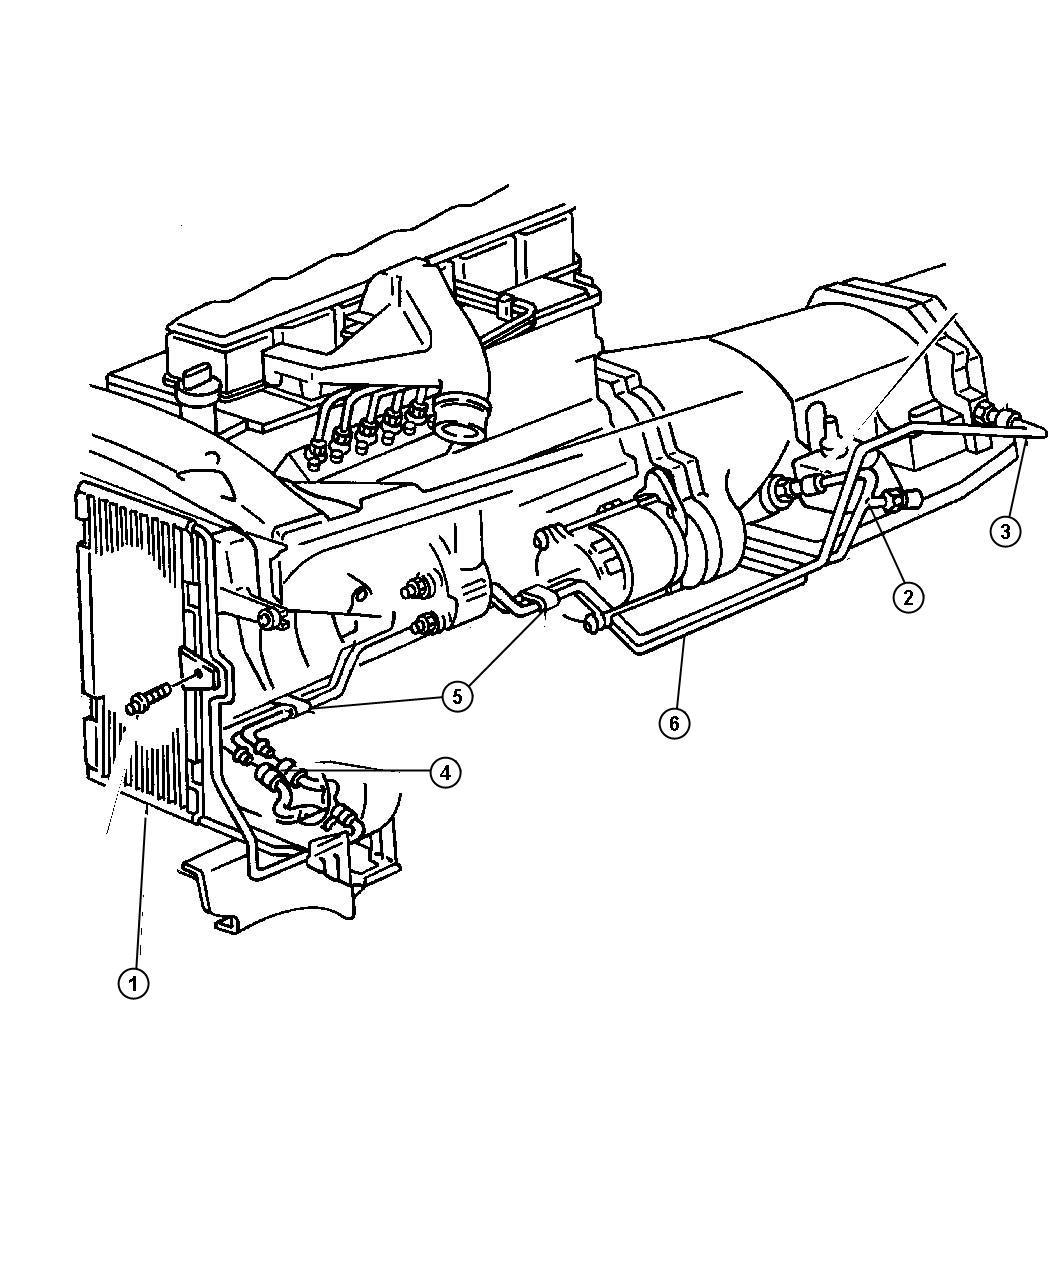 2001 Dodge Ram 2500 Engine Diagram Wiring Diagram Loot Method Loot Method Lasuiteclub It